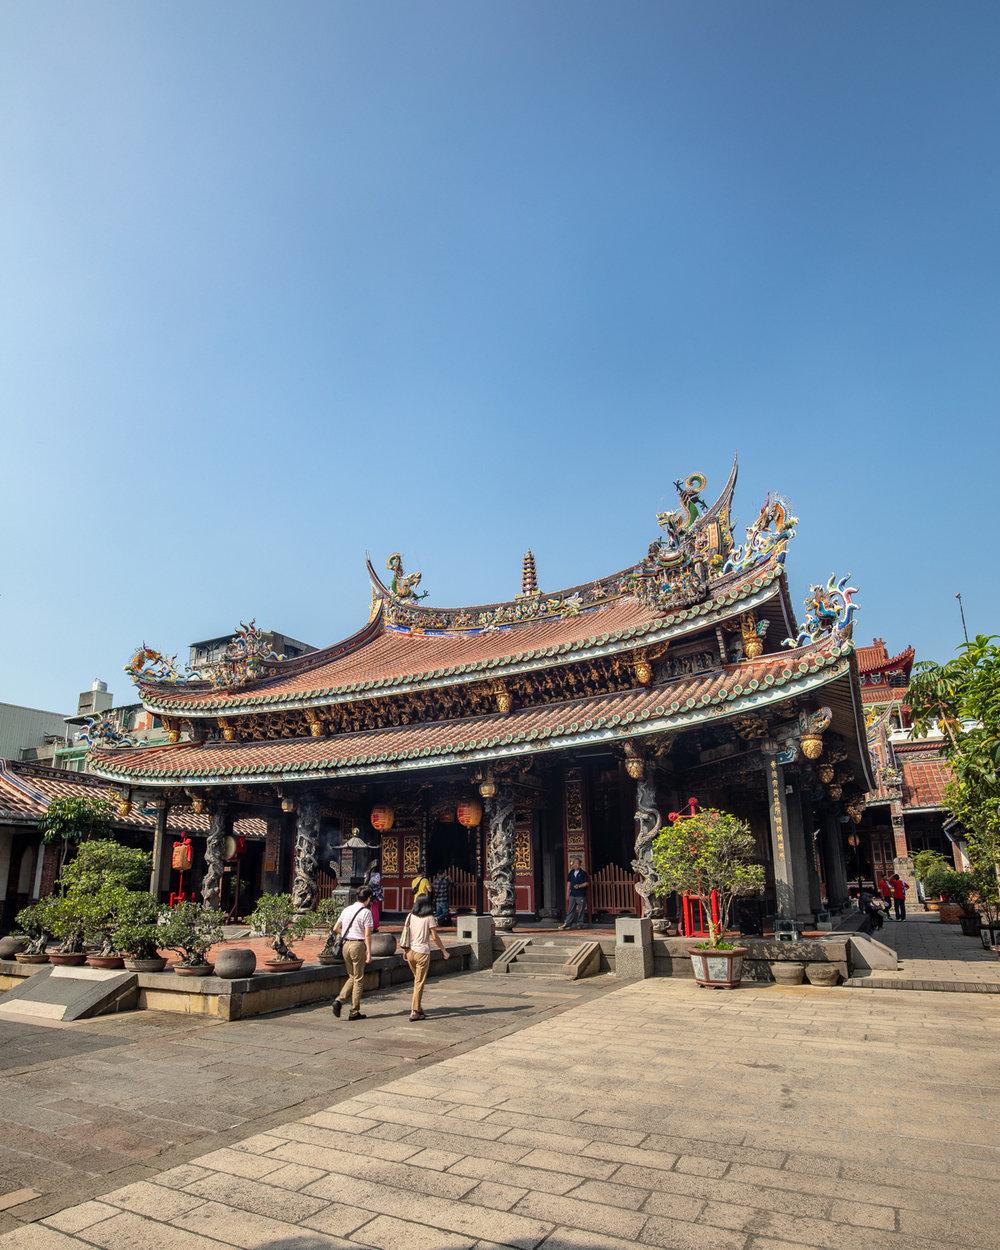 Things to do in Taipei - Bao'an Temple